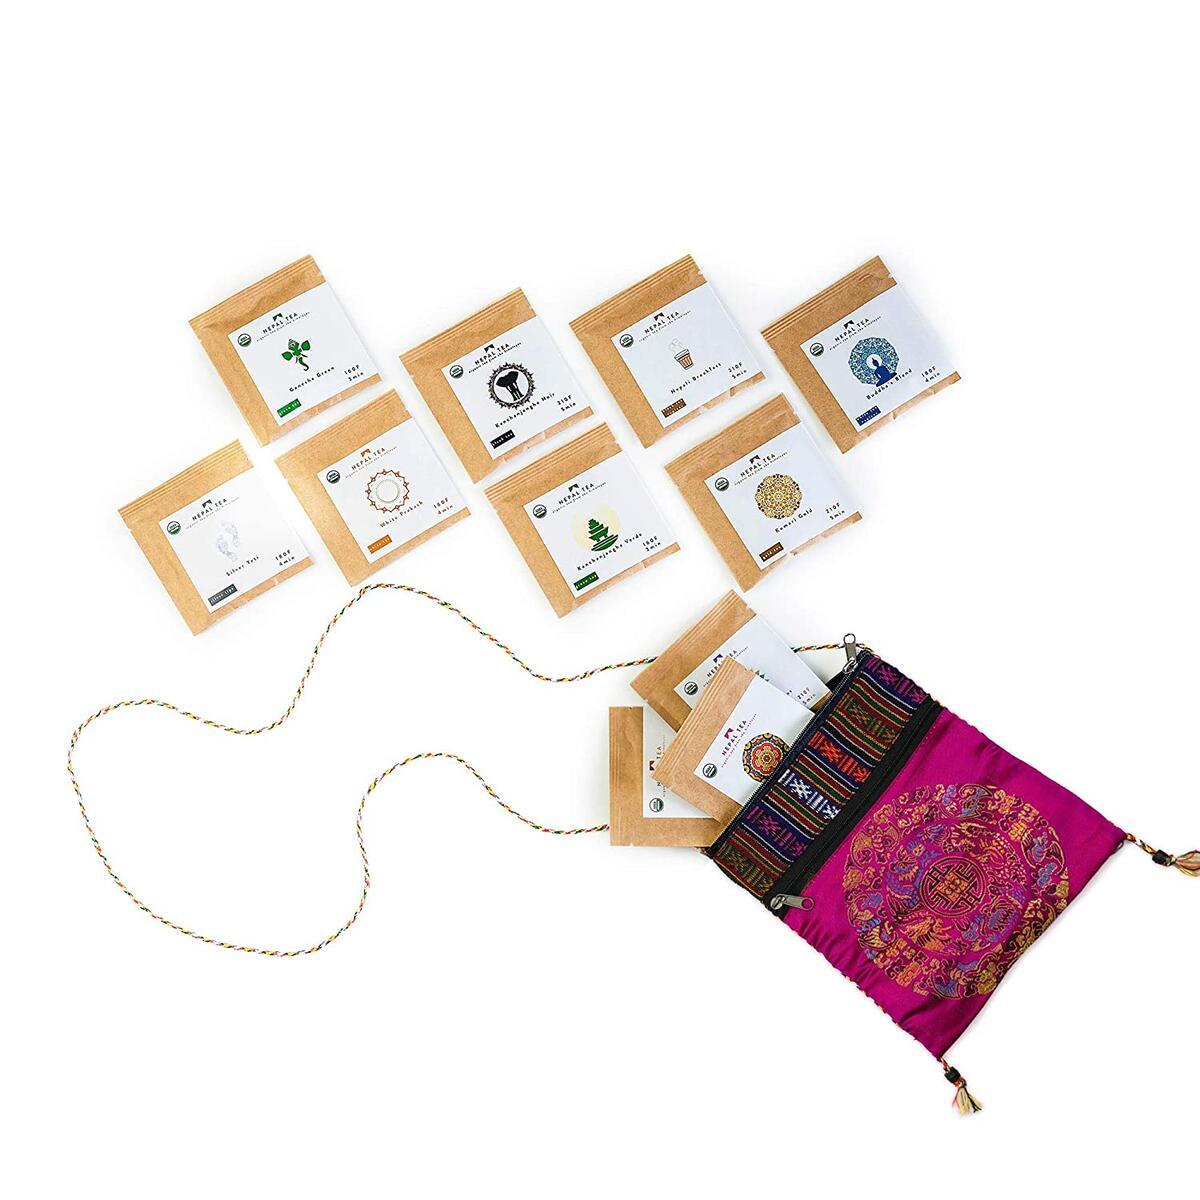 Loose Leaf Tea Sampler Set Travel Pouch, Loose Leaf Tea Set, Nepali Tea Leaves Gift Set, Loose Leaf Tea Variety, Loose Tea Sampler Tea Kit from the Himalayas, 11 ct. 4.5 oz. (Approx. 25 to 30 Cups of Tea) Pink - Nepal Tea